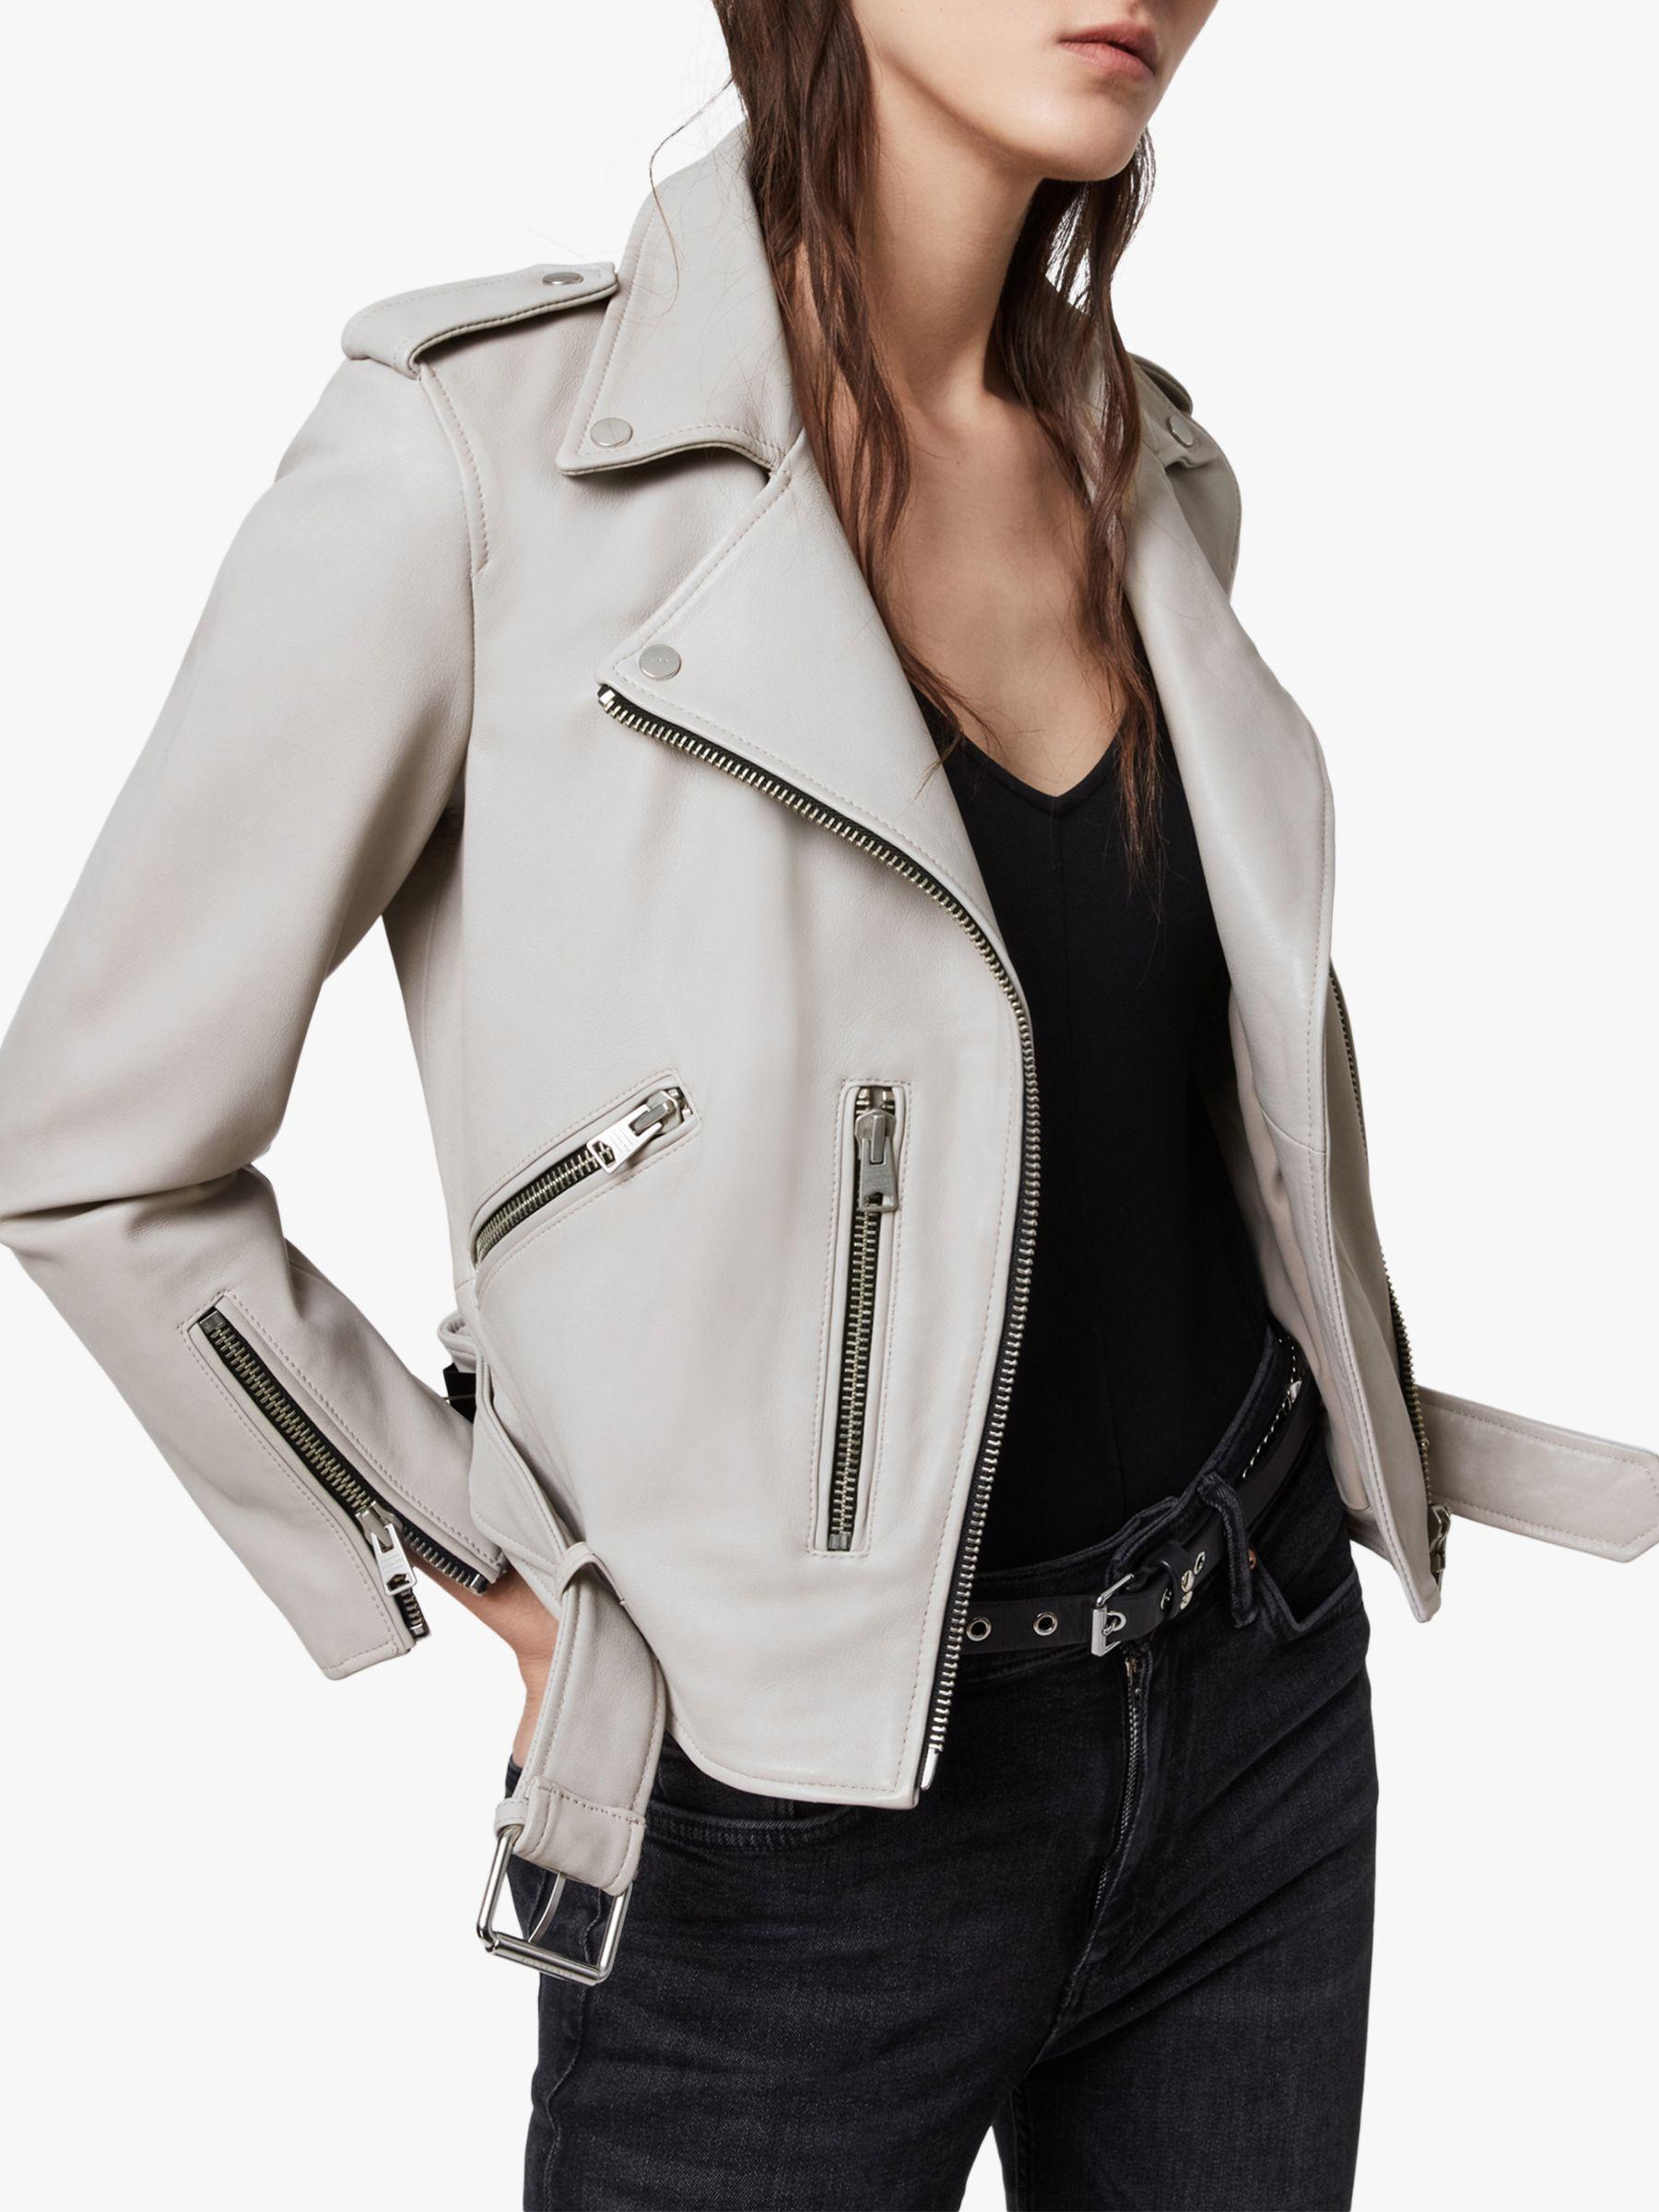 AllSaints Balfern Leather Biker Jacket, Cement Grey at John